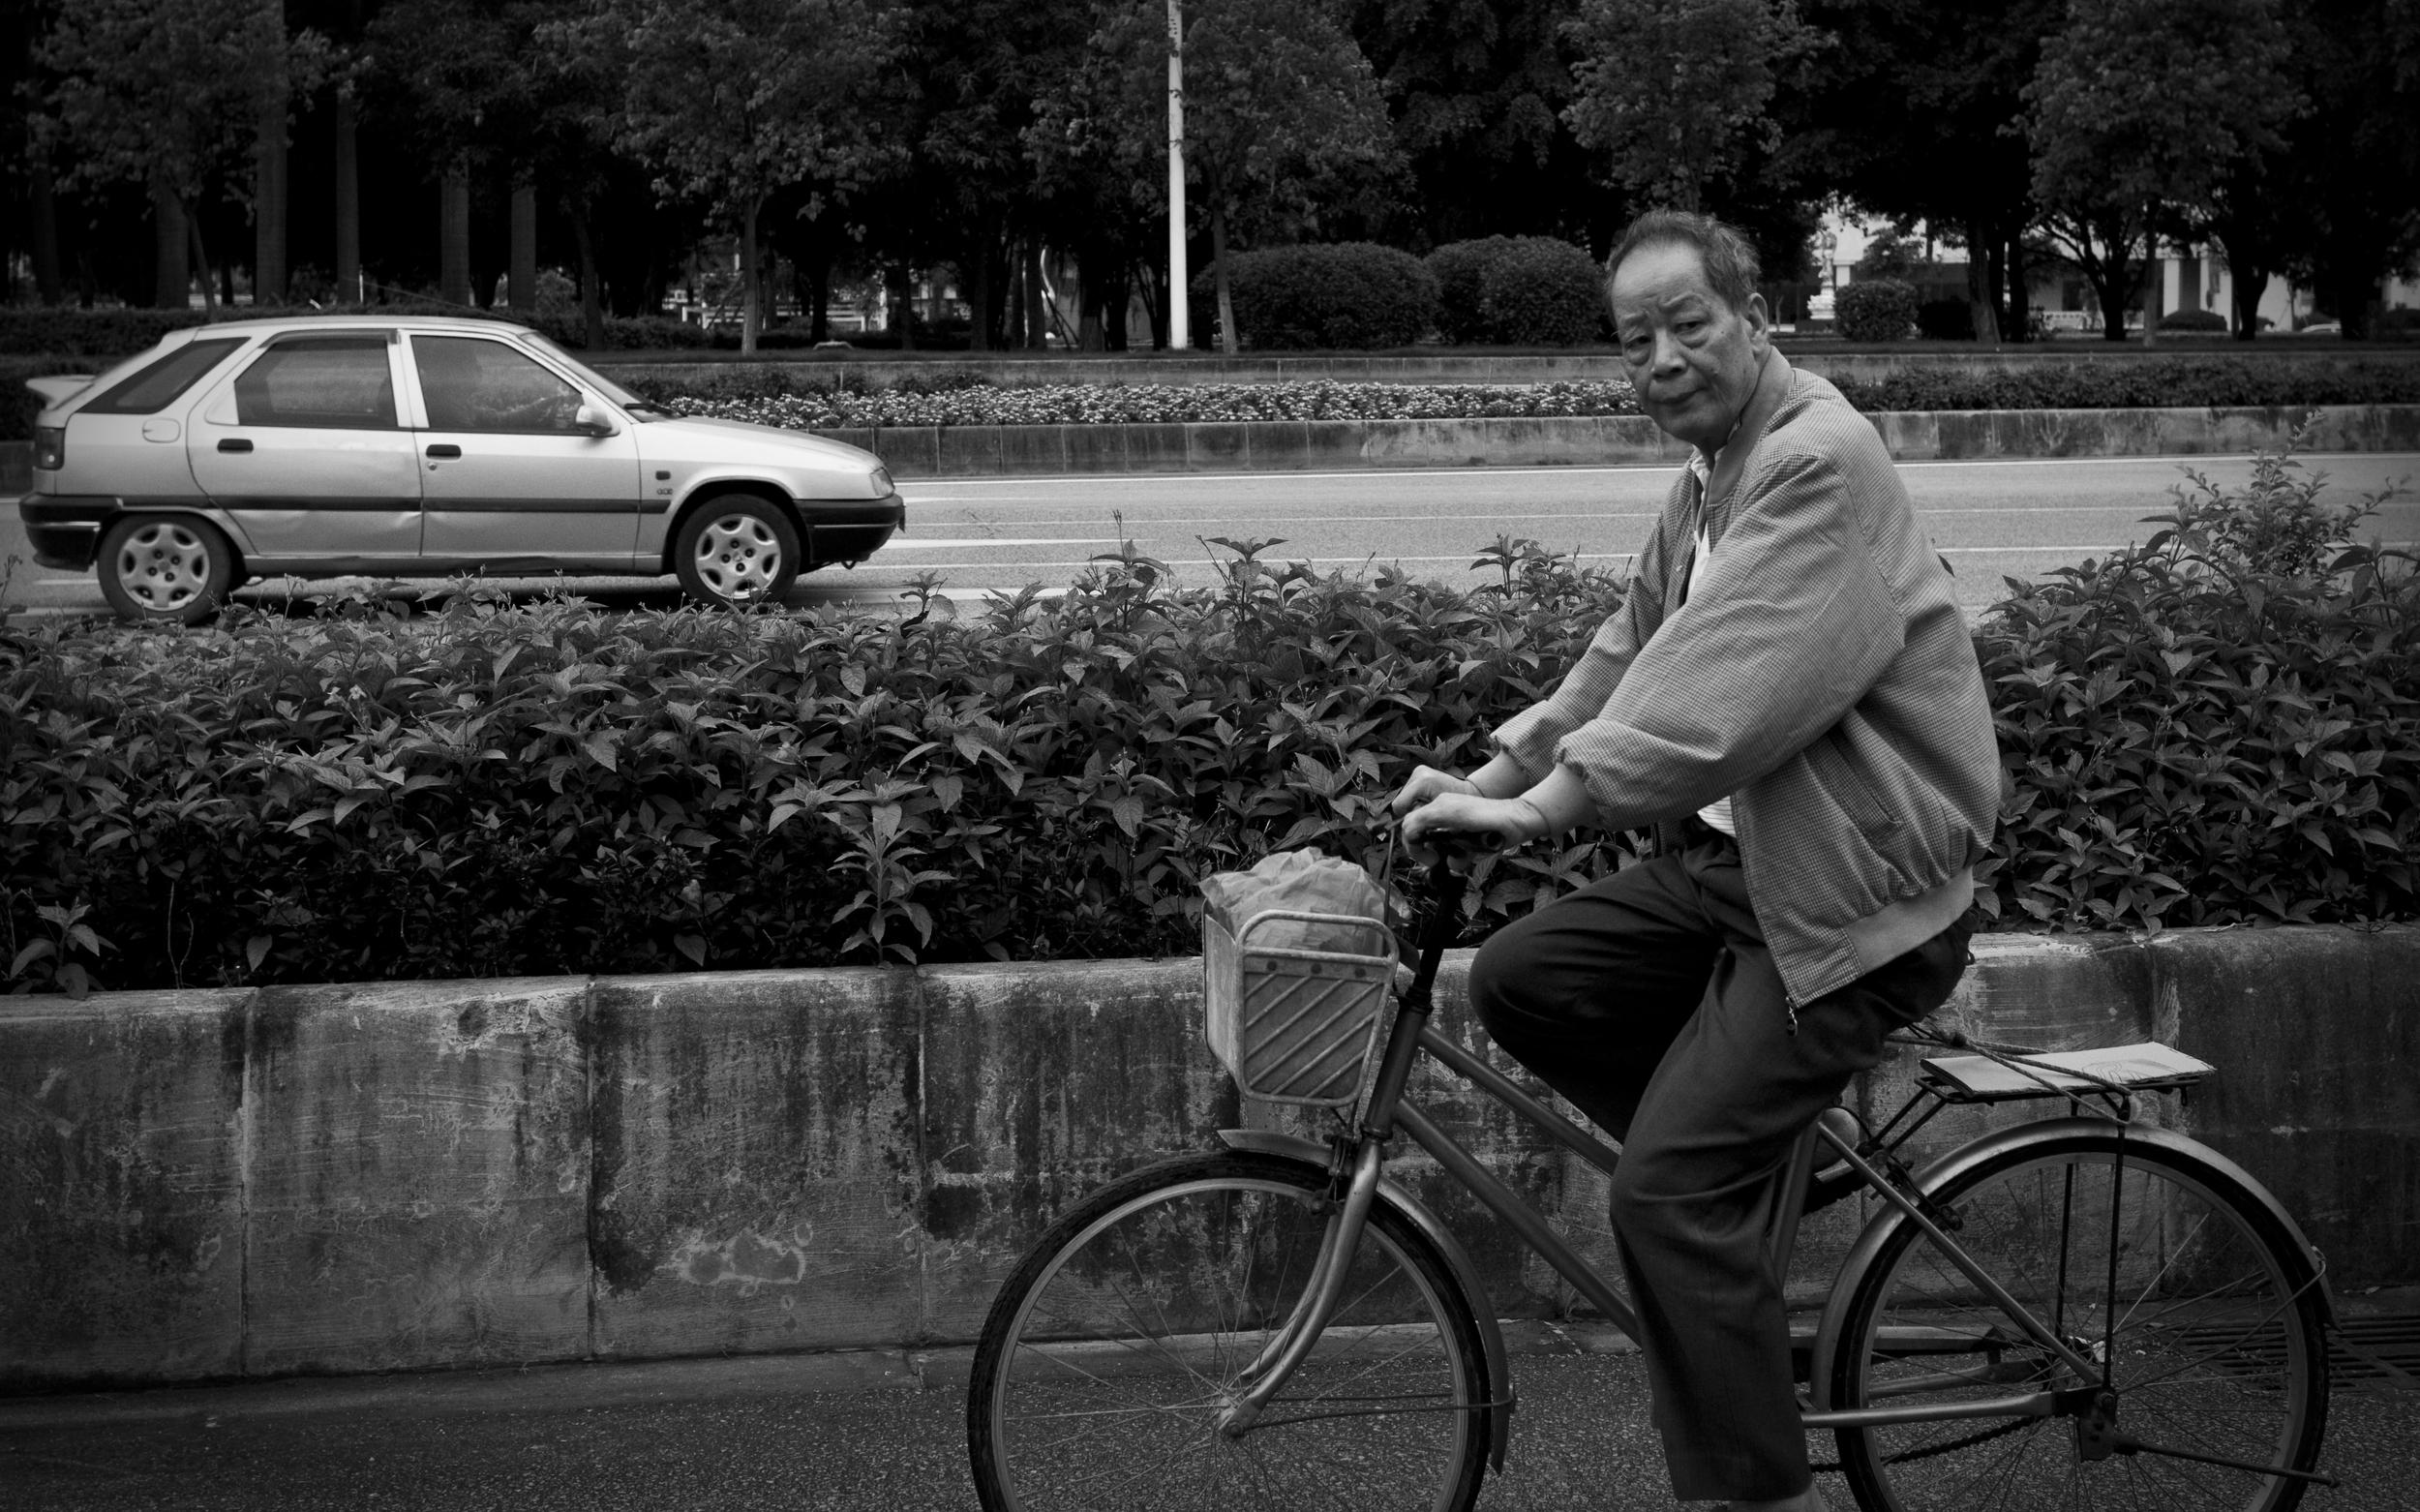 china_bike_man_bw.jpg